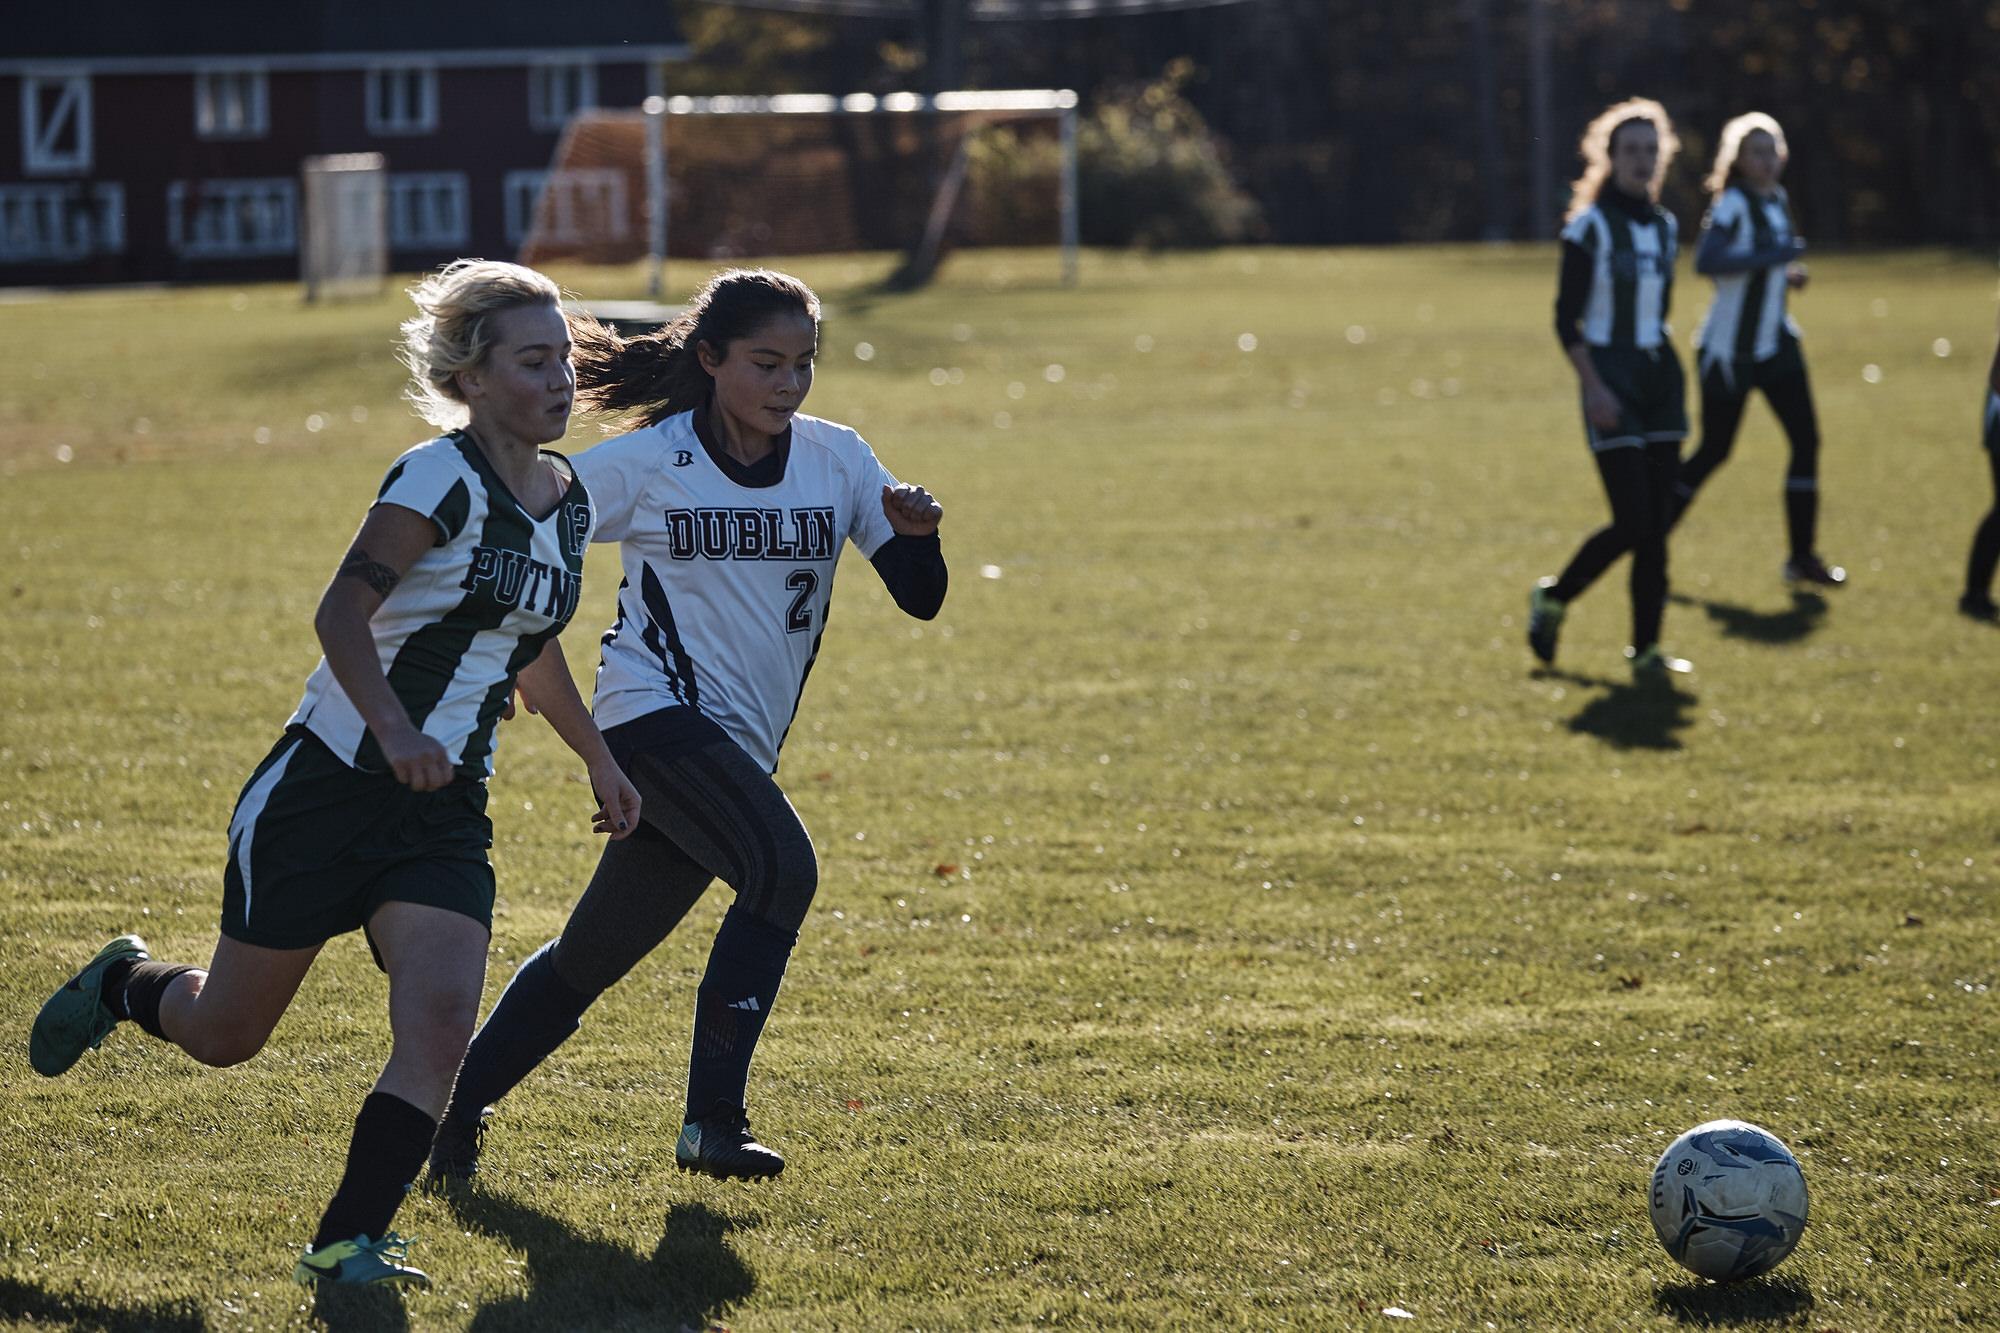 Girls Varsity Soccer vs. Putney School - October 26, 2018 - 021.jpg